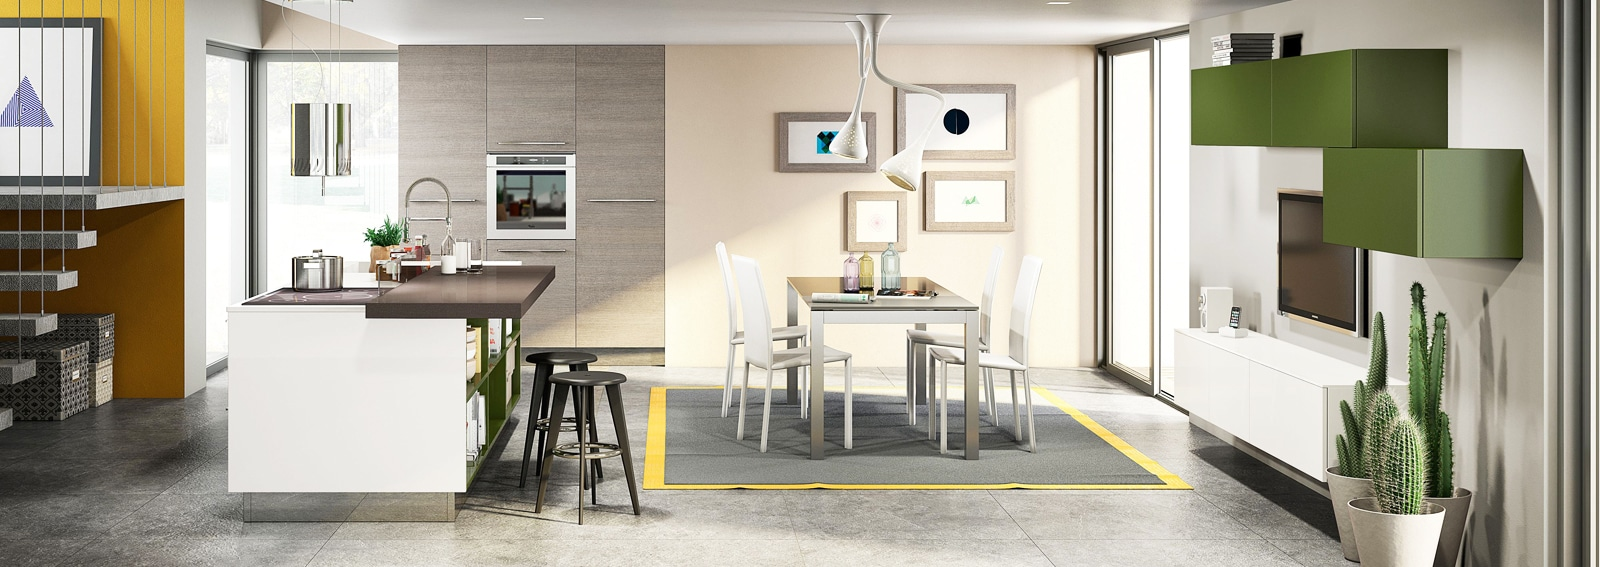 Emejing Le Cucine Moderne Più Belle Contemporary - Home Ideas ...